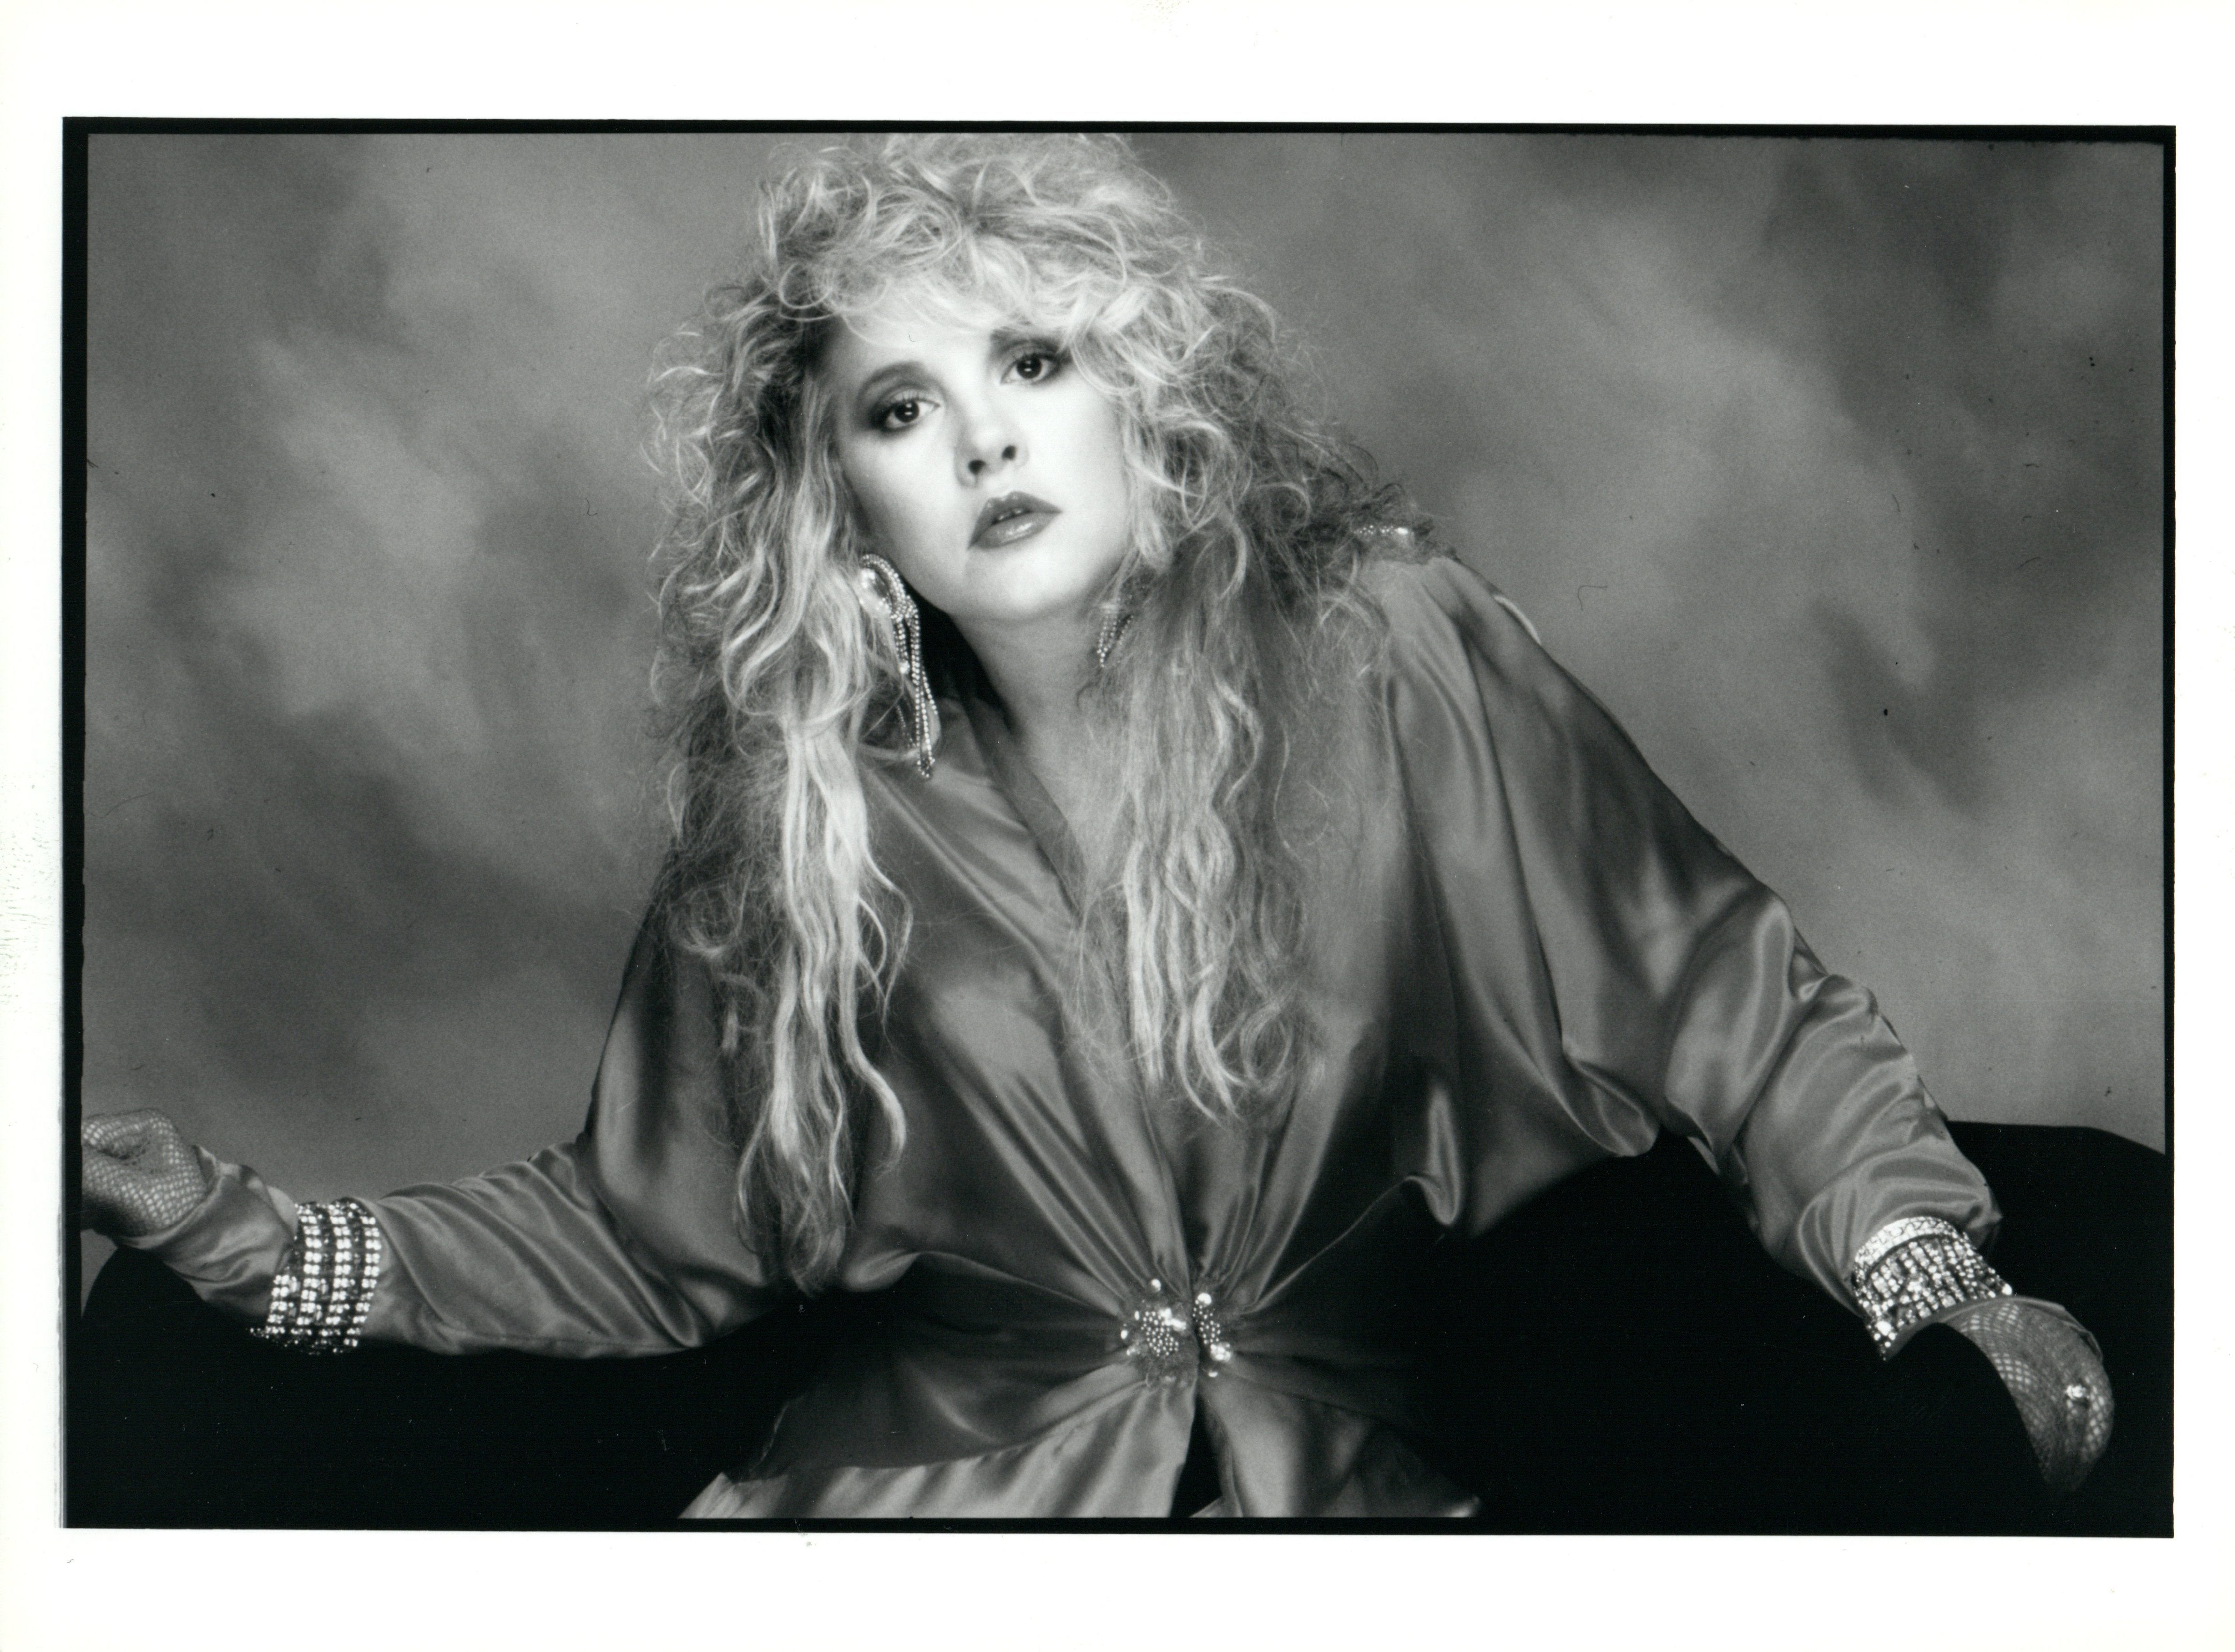 Stevie nicks in studio vintage original photograph